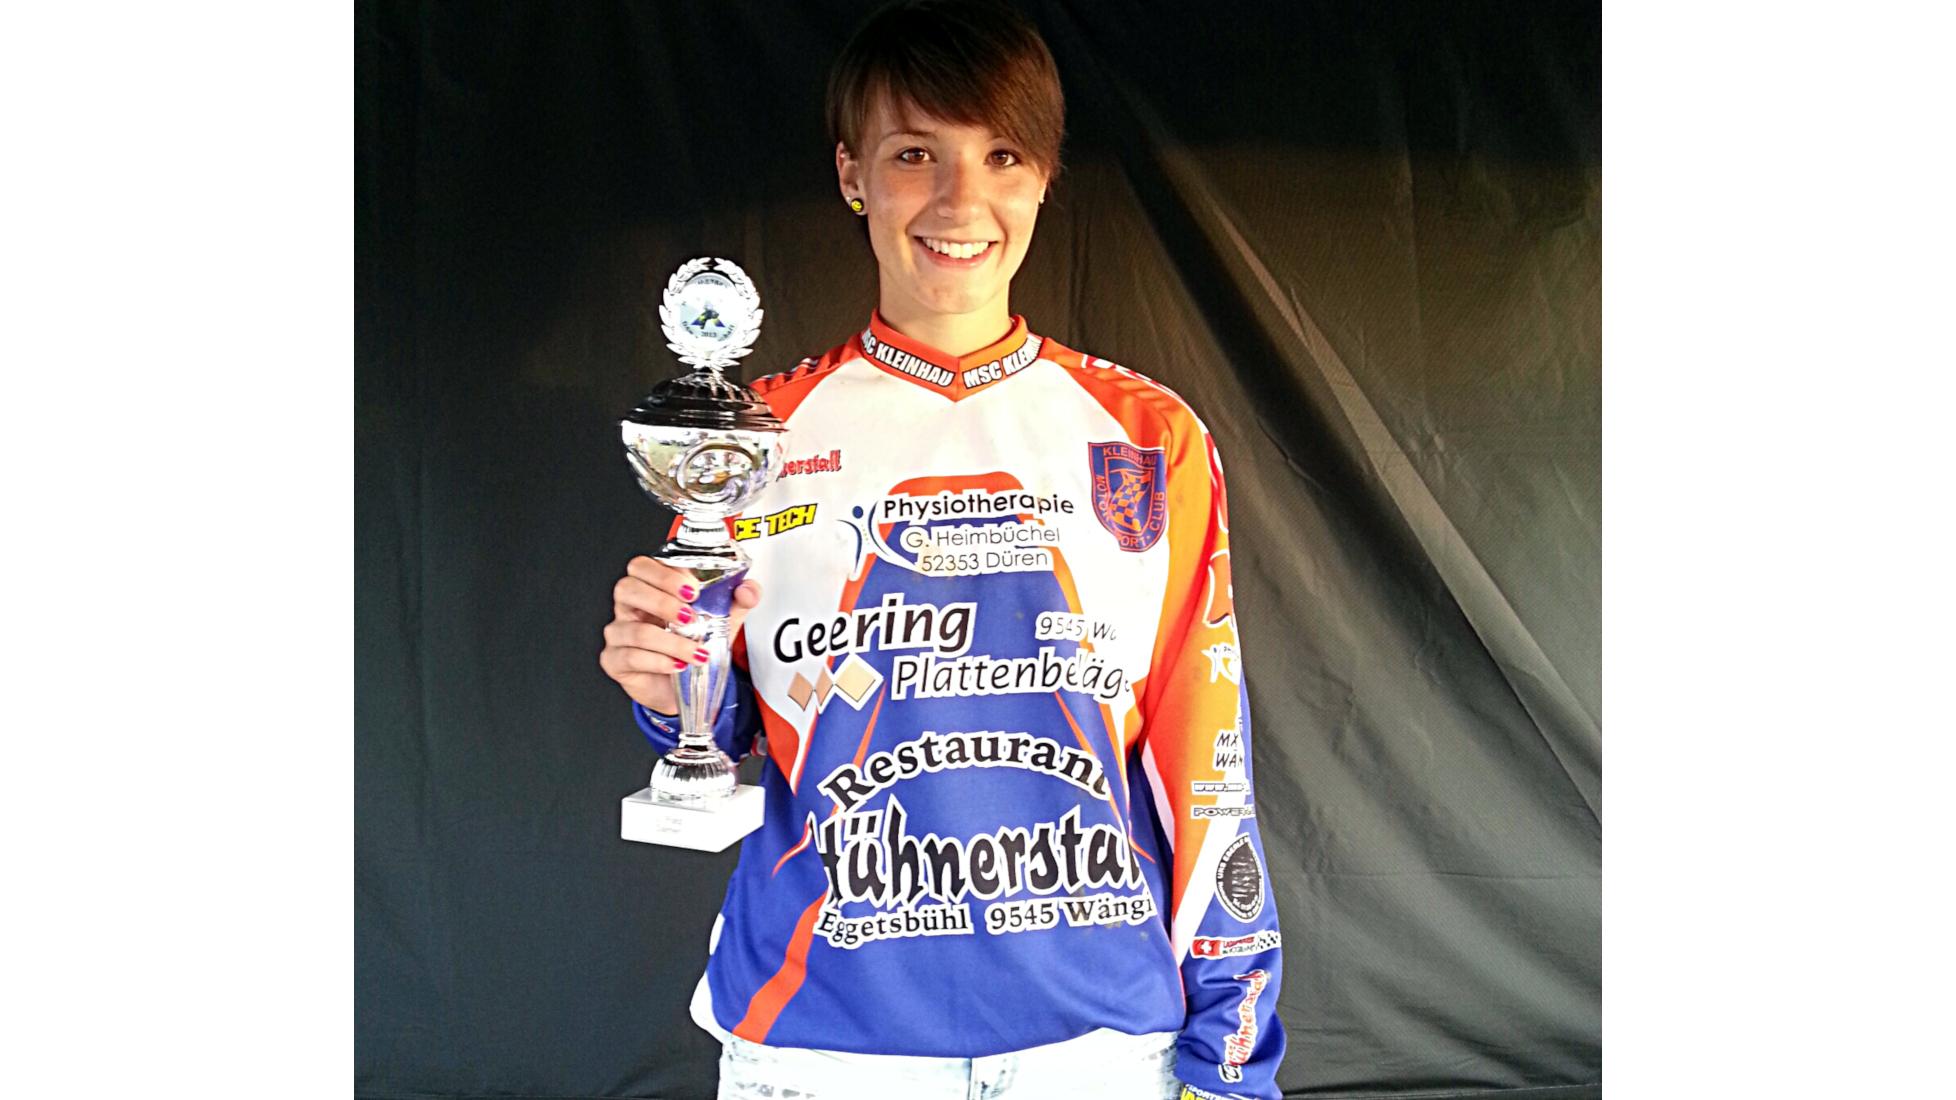 Besonderes Rennen Teil I - Nina Heimbüchel- Motocross-Adventskalender - miradlo Versanddepot